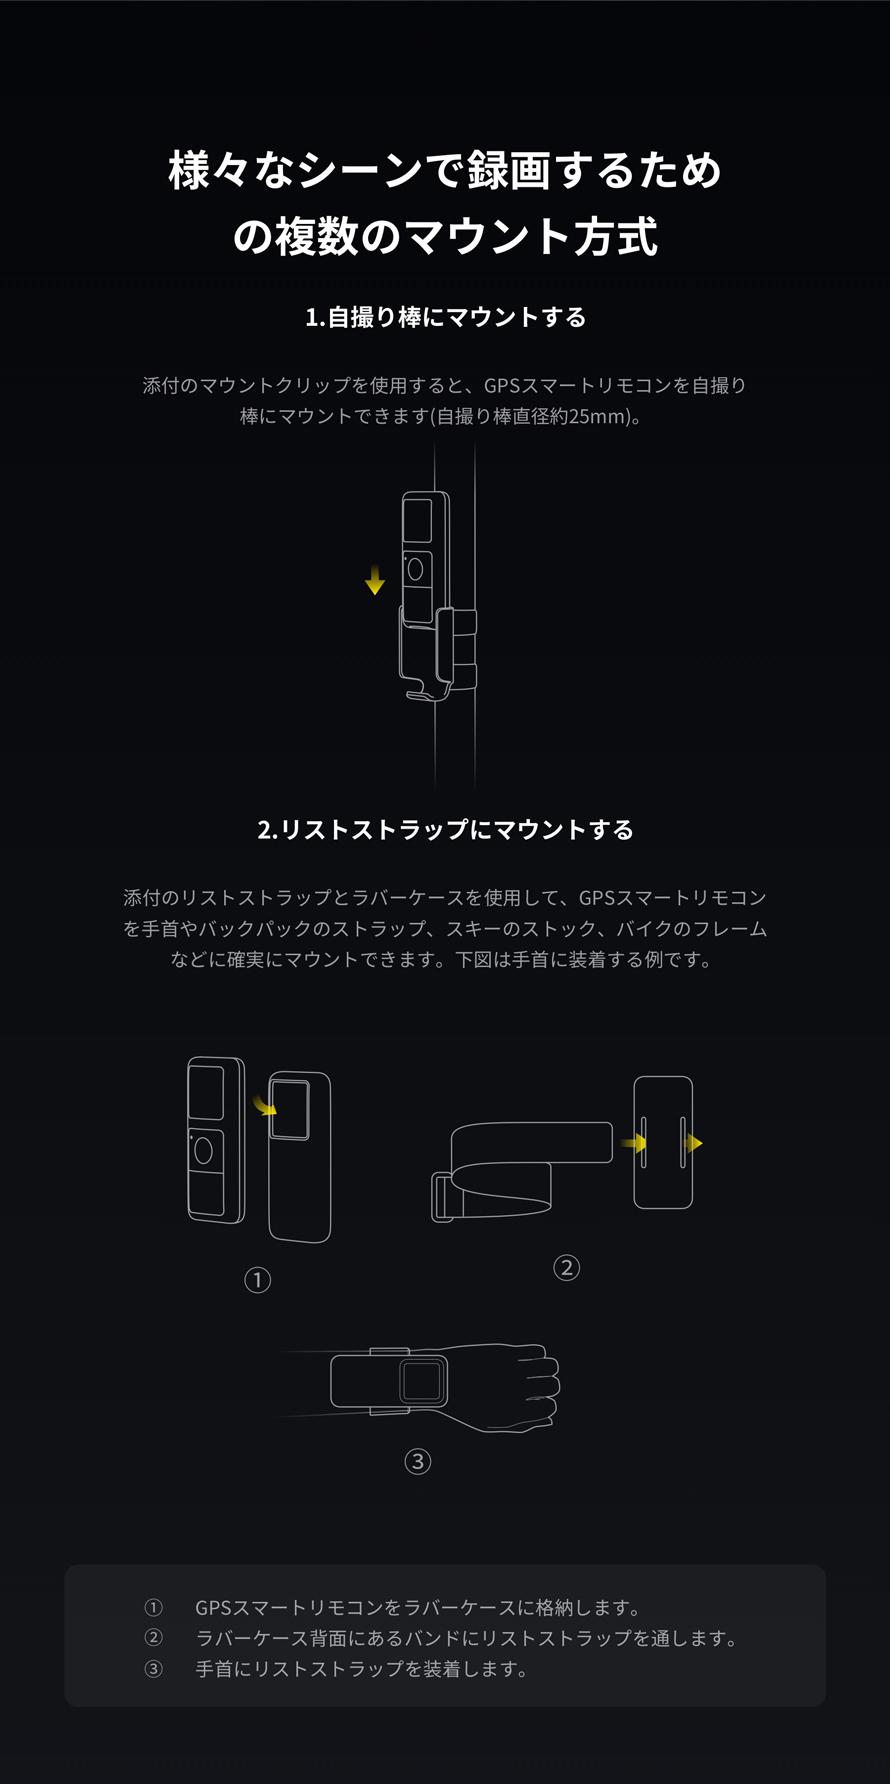 Insta360 ONE R | 複数のマウント方式